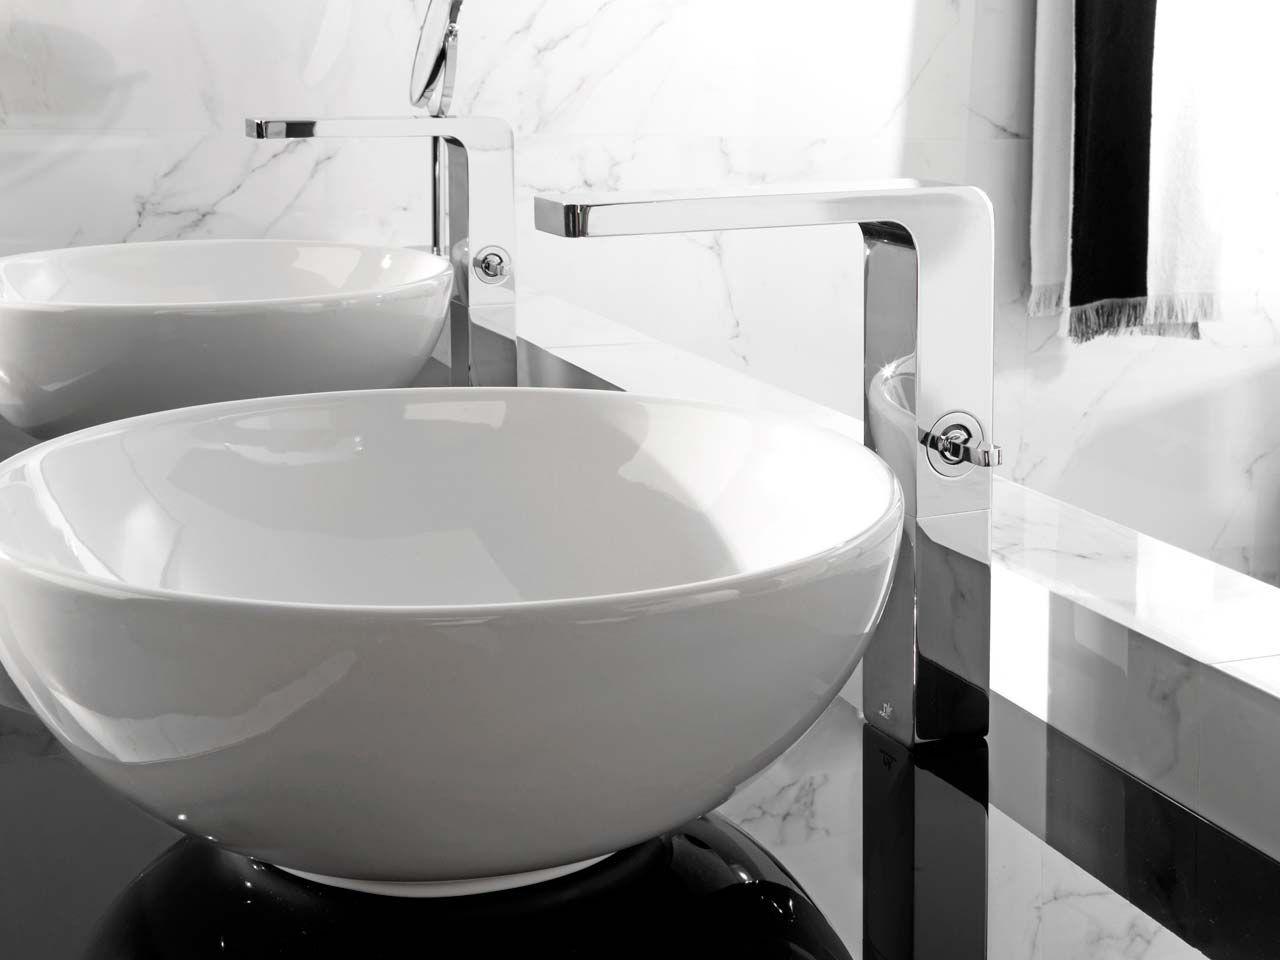 Lavabo porcelanosa monomando home bathroom pinterest - Baldosas bano porcelanosa ...